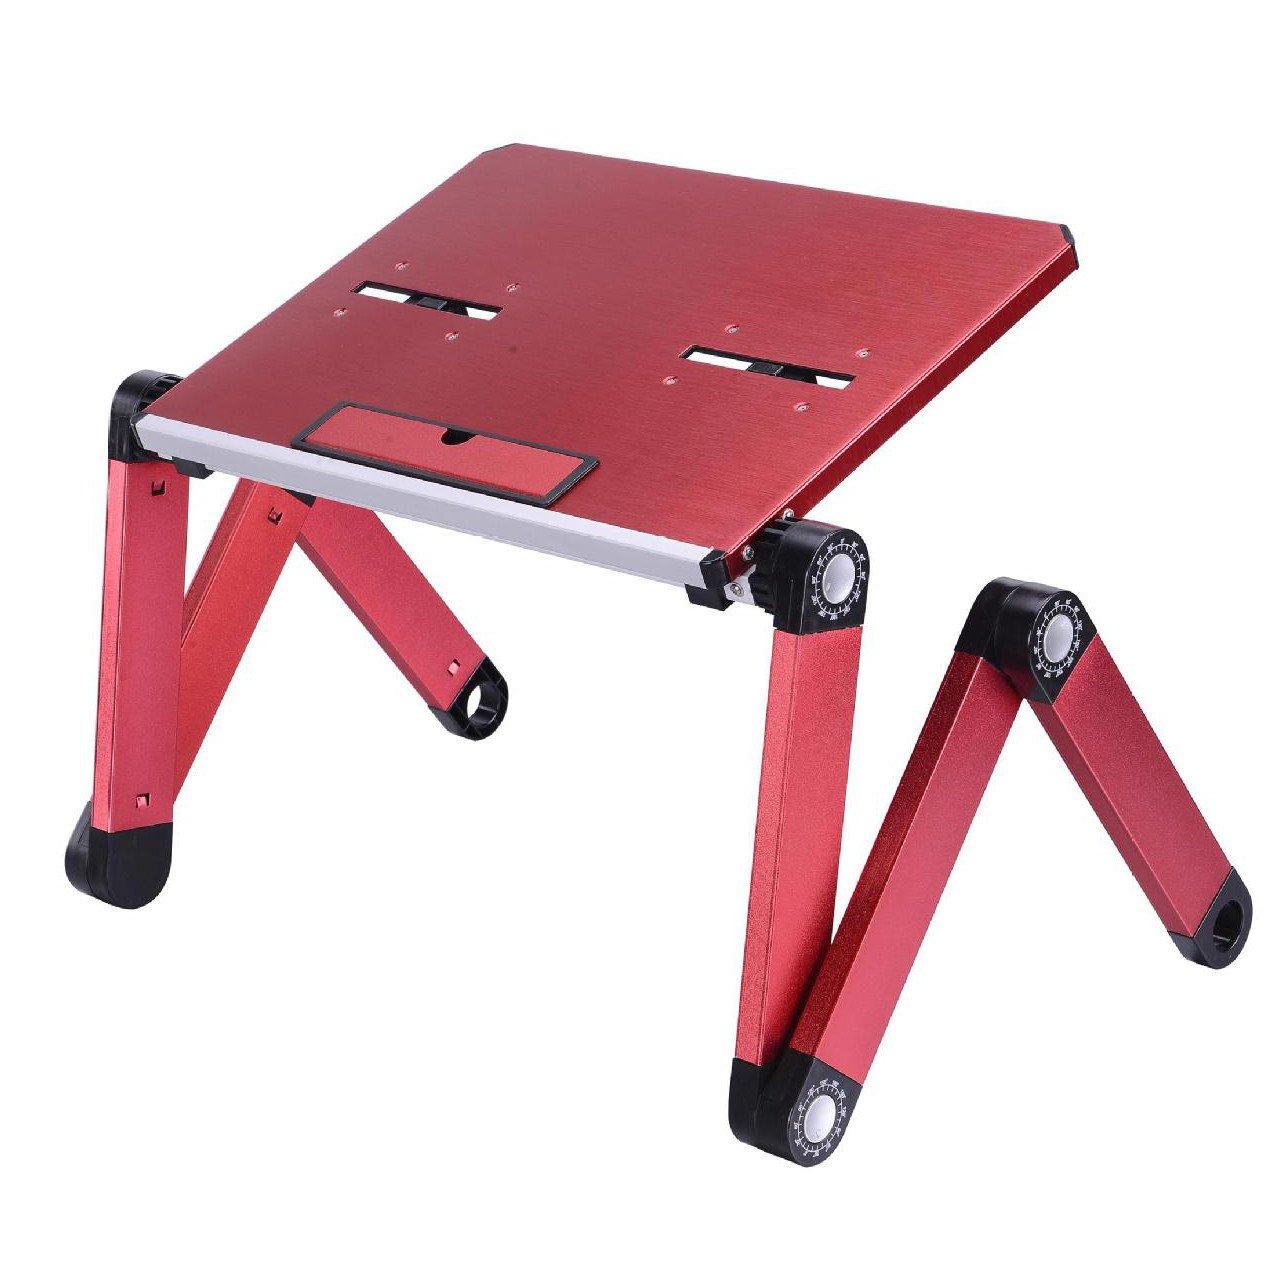 Qiaoba- Minimalist Aluminum Alloy Folding Computer Desk desks, Blue,50285.5CM